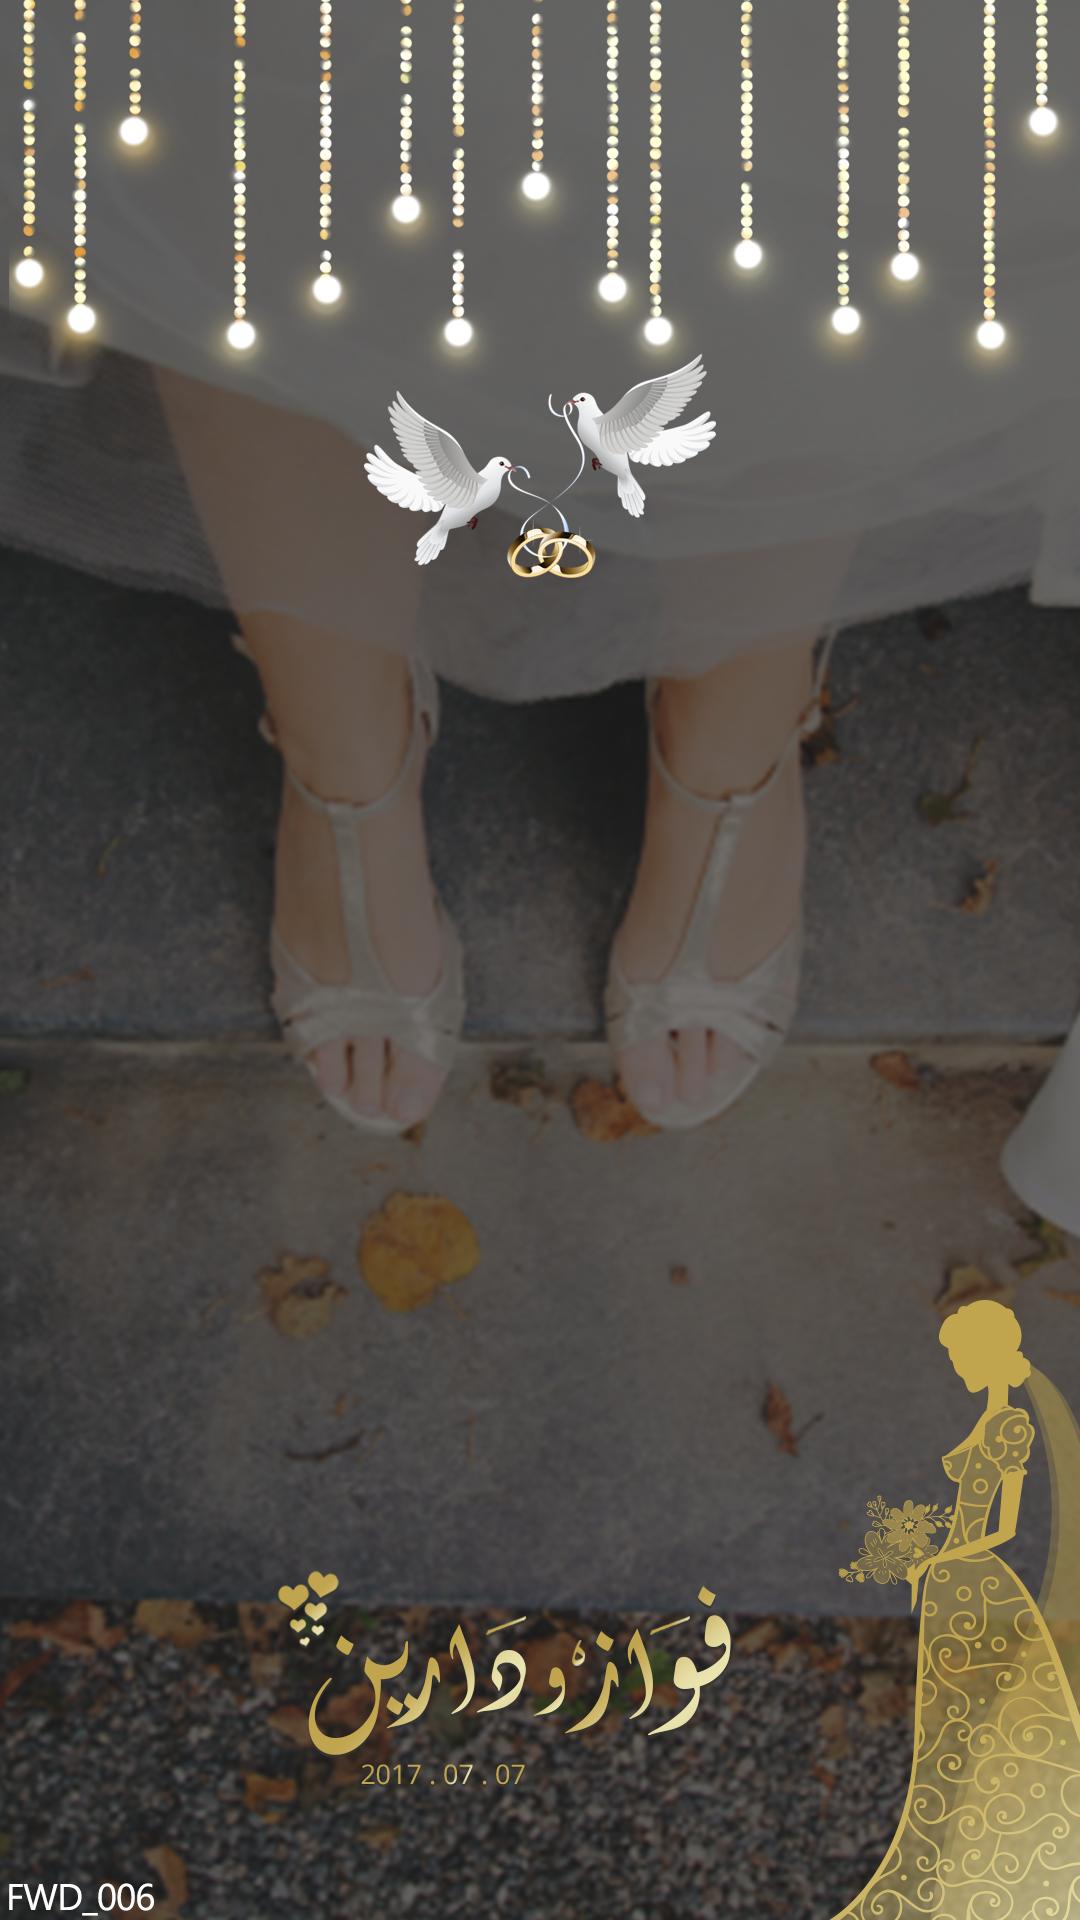 Pin By تصميم فلاتر سناب شات On تصميم فلاتر سناب شات Chandelier Lyrics How To Make A Chandelier Wedding Snapchat Filter